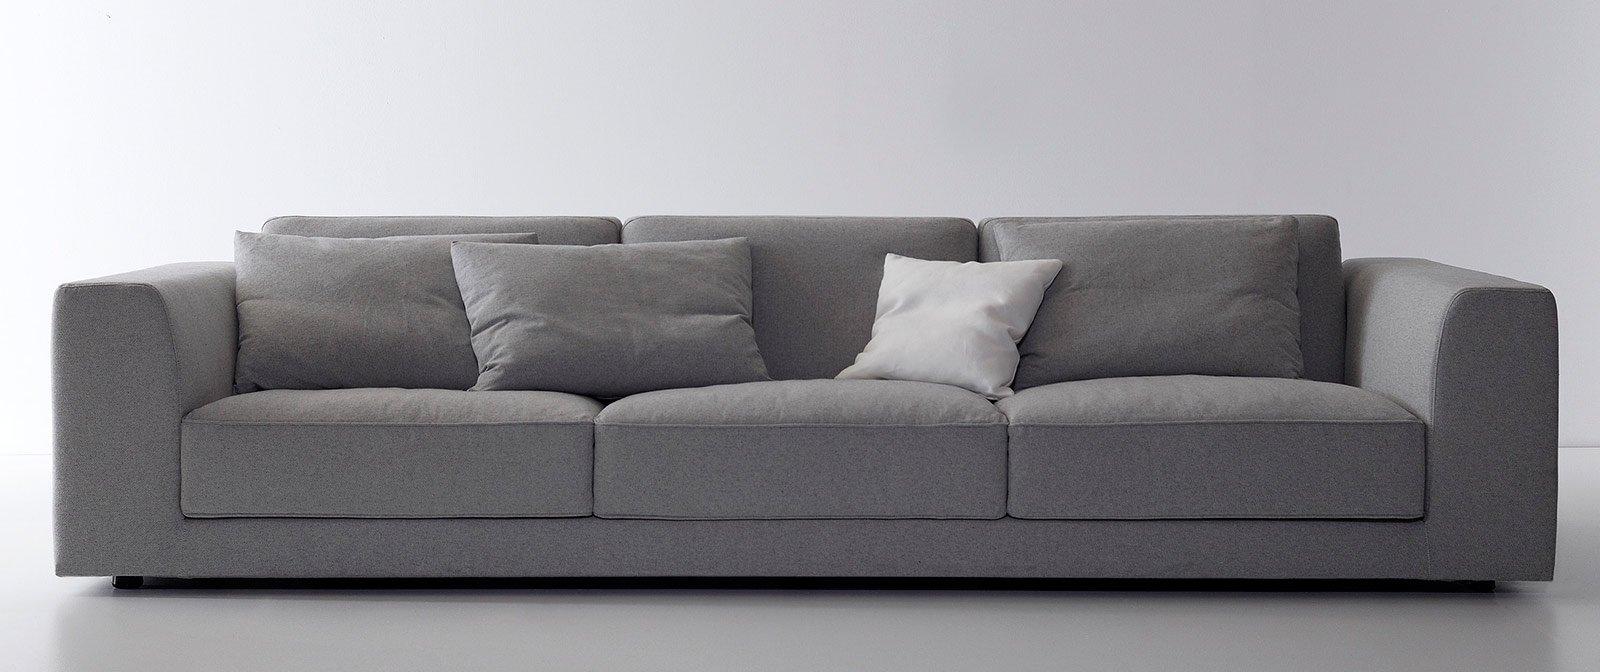 Mobili lavelli misura divano tre posti for Vendita online divani